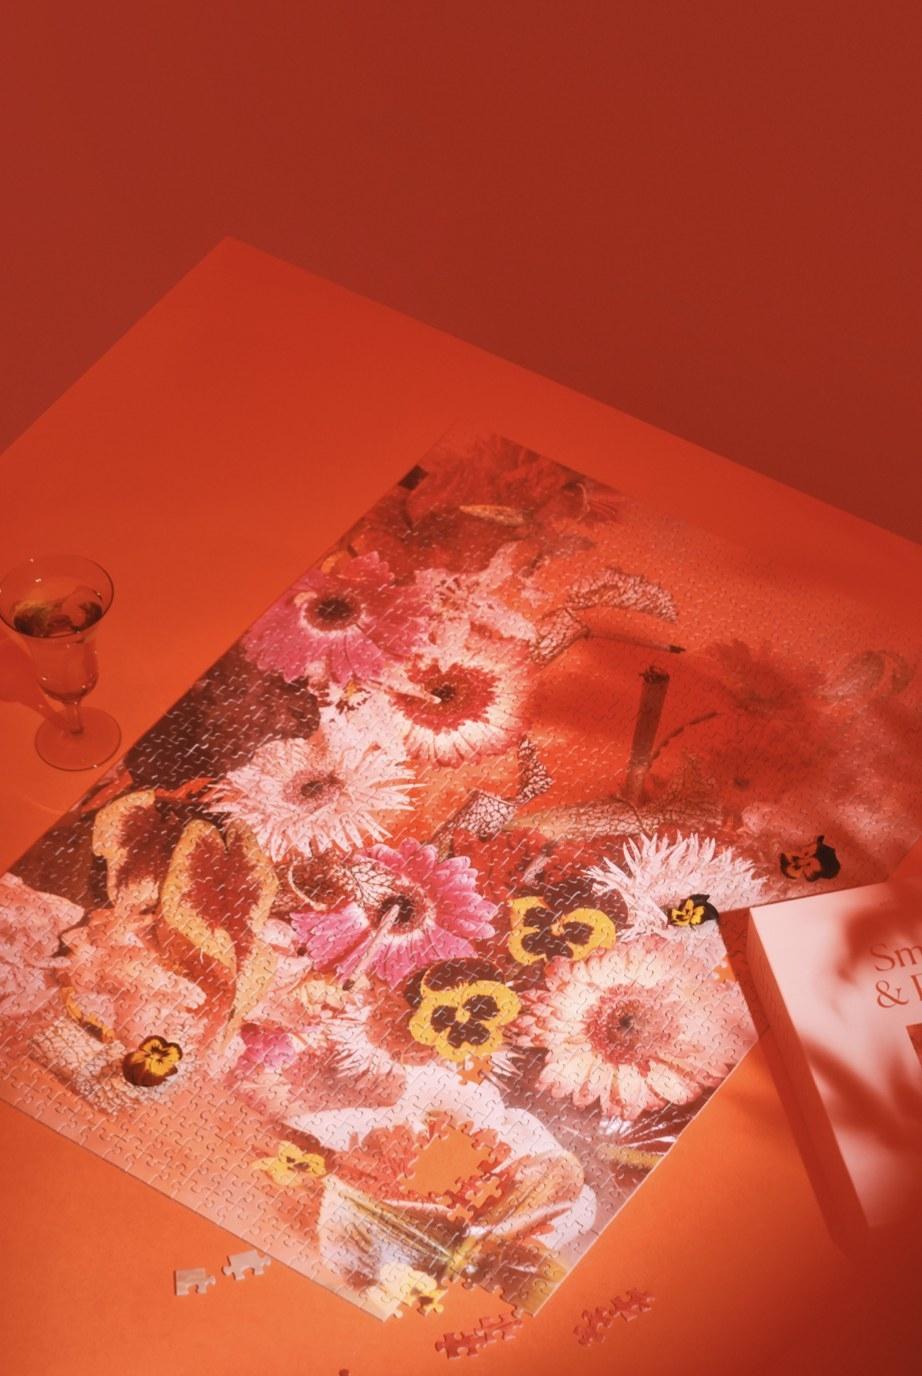 The Smoke & Petals puzzle assembled